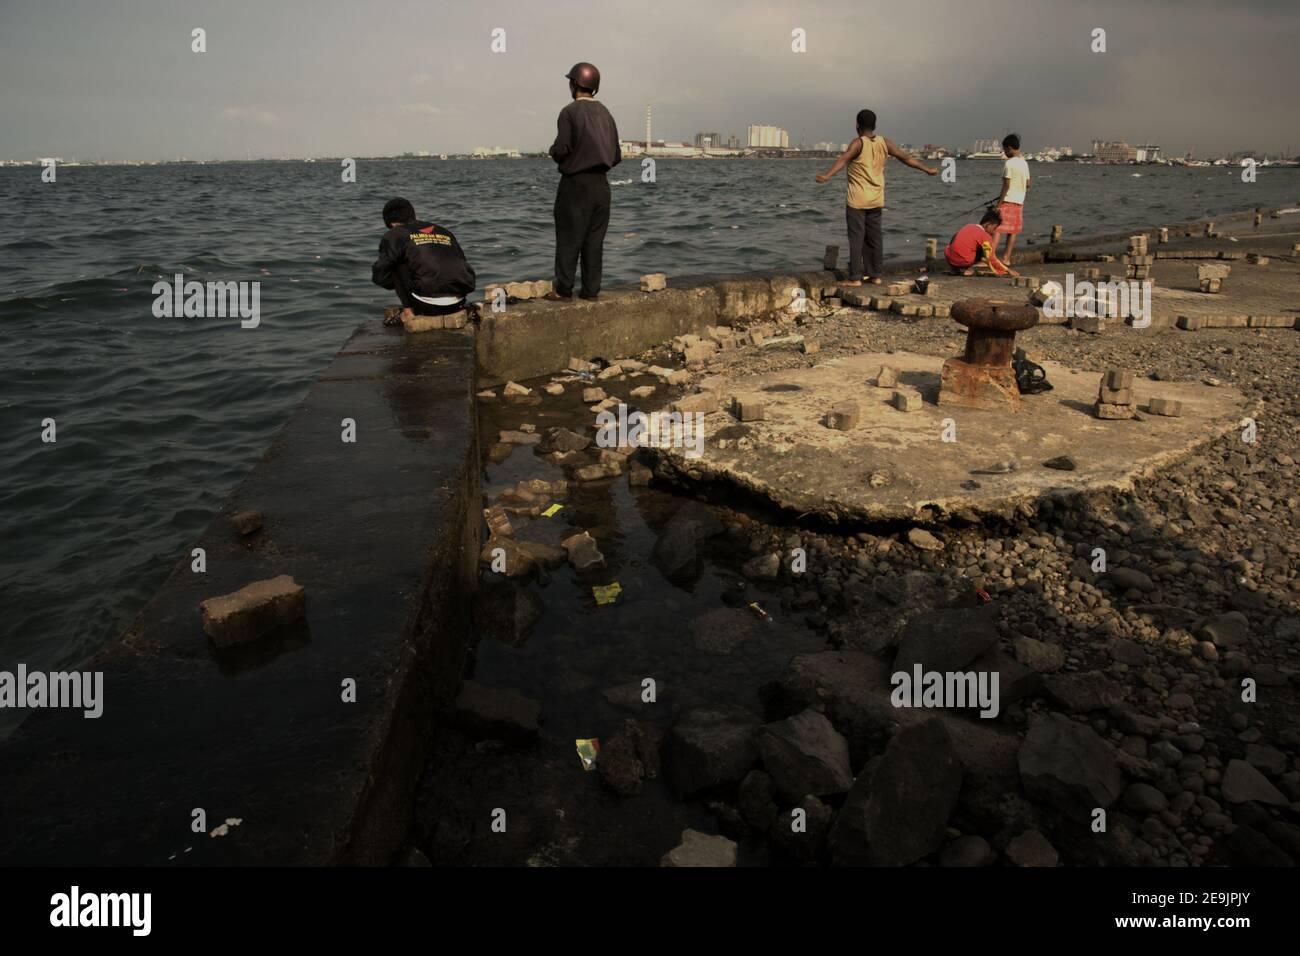 People having outdoor recreation by fishing from an abandoned harbour platform in Muara Baru area, Penjaringan, Jakarta, Indonesia. Stock Photo